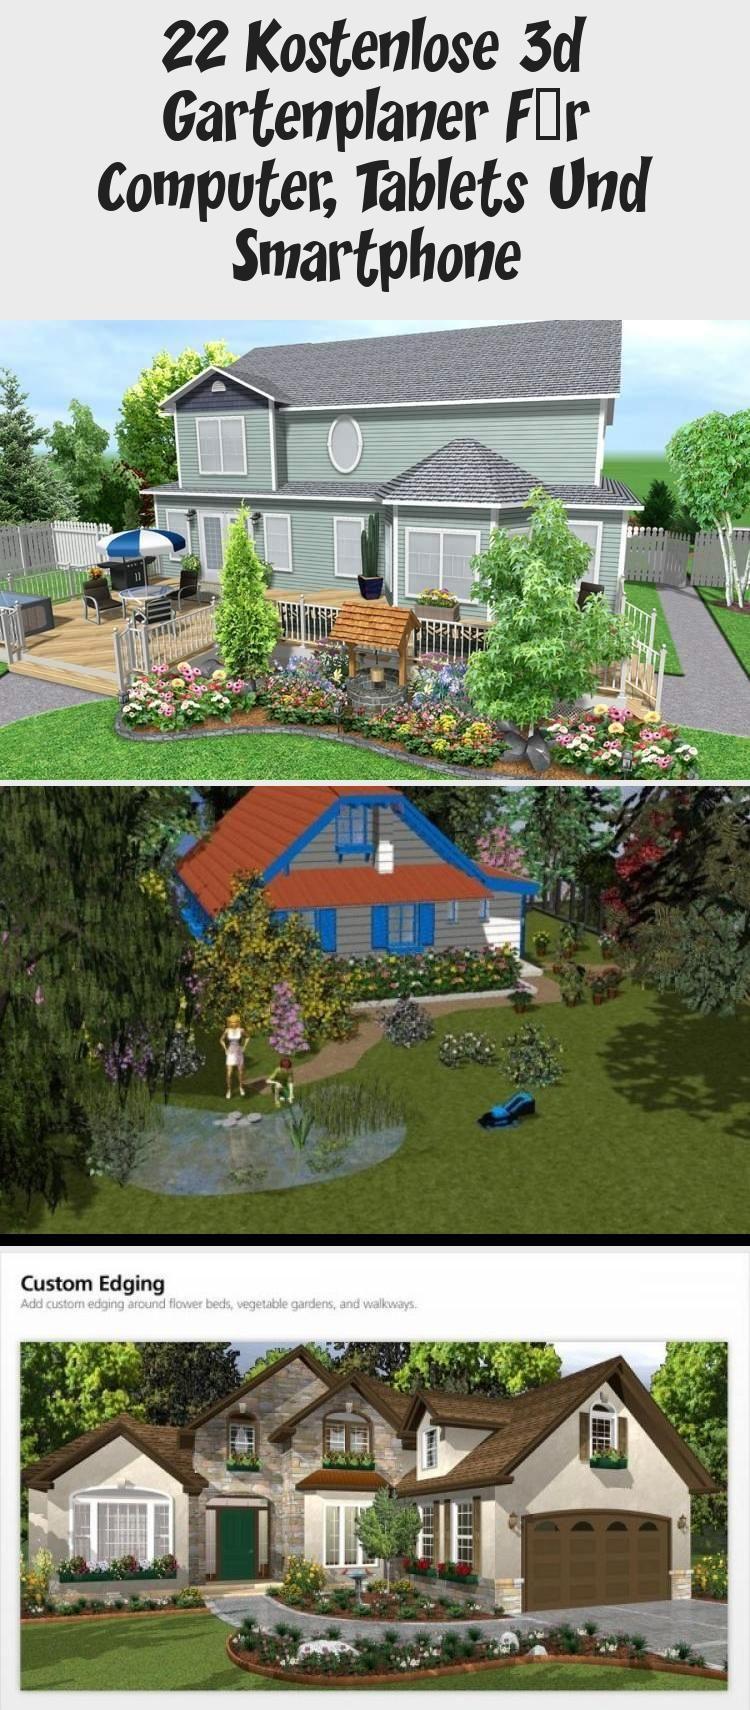 Gartenplanung Software Kostenlos